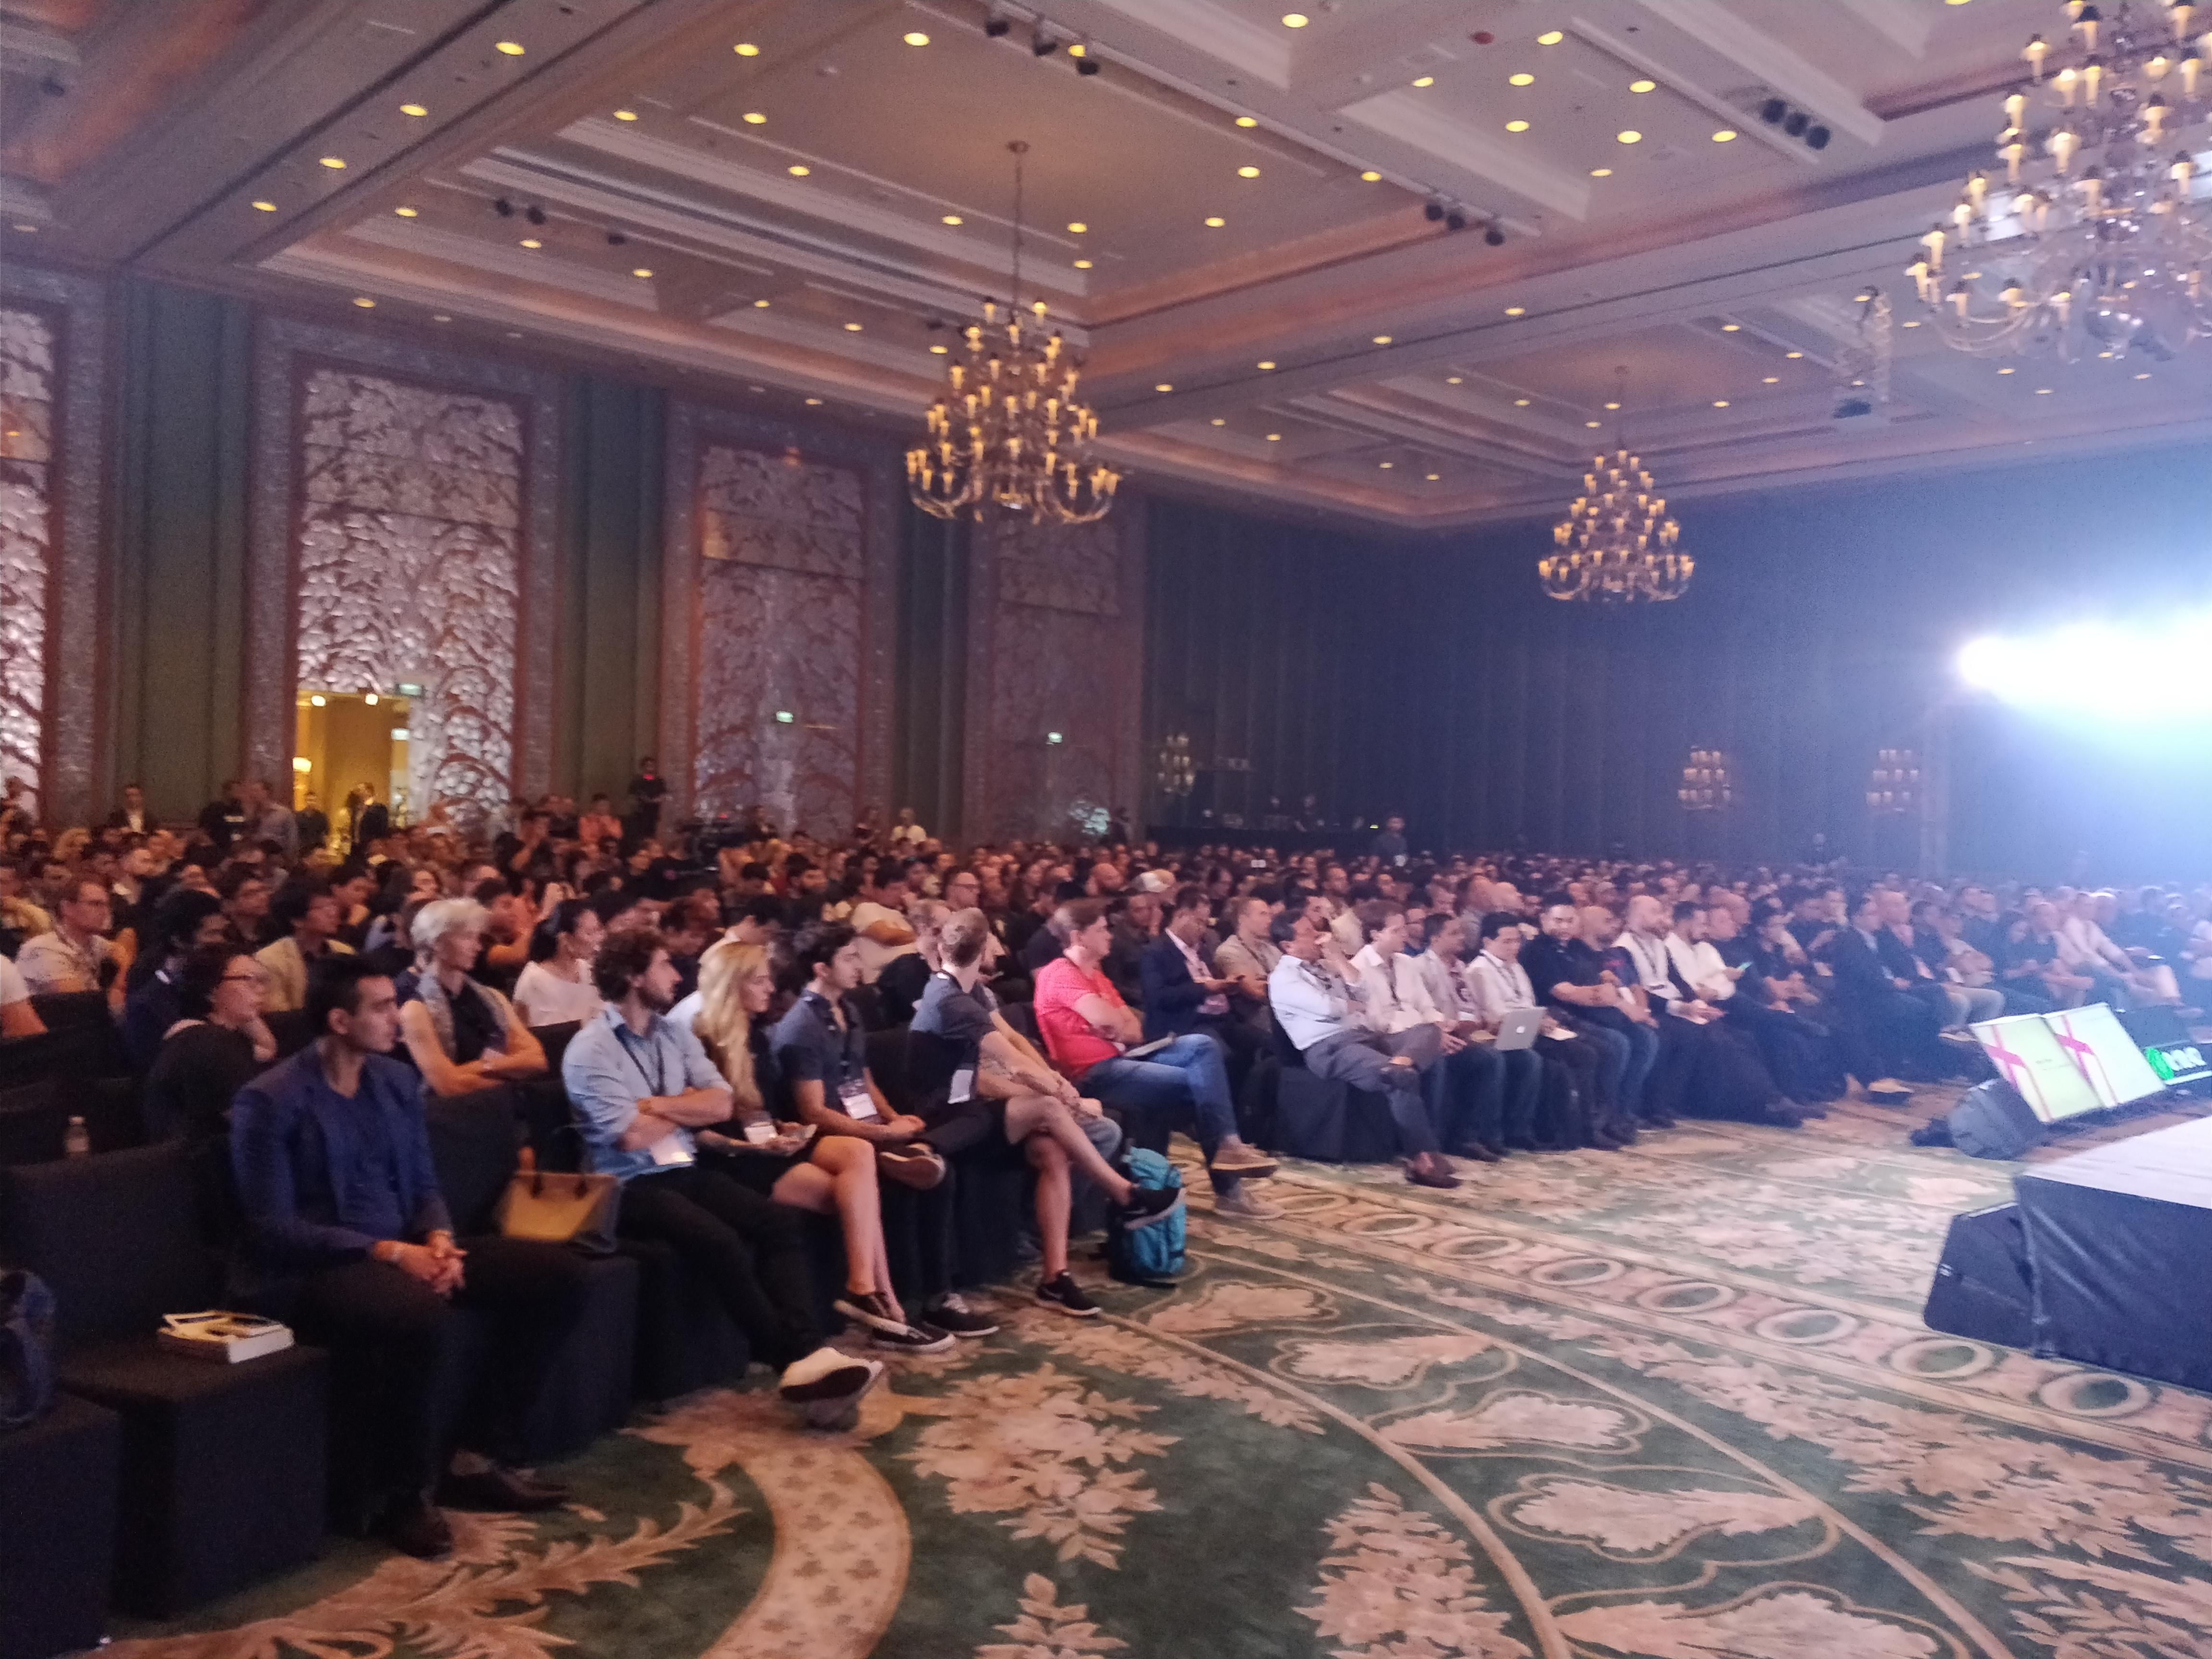 Blockchain World Conference 2017Blockchain World Conference 2017